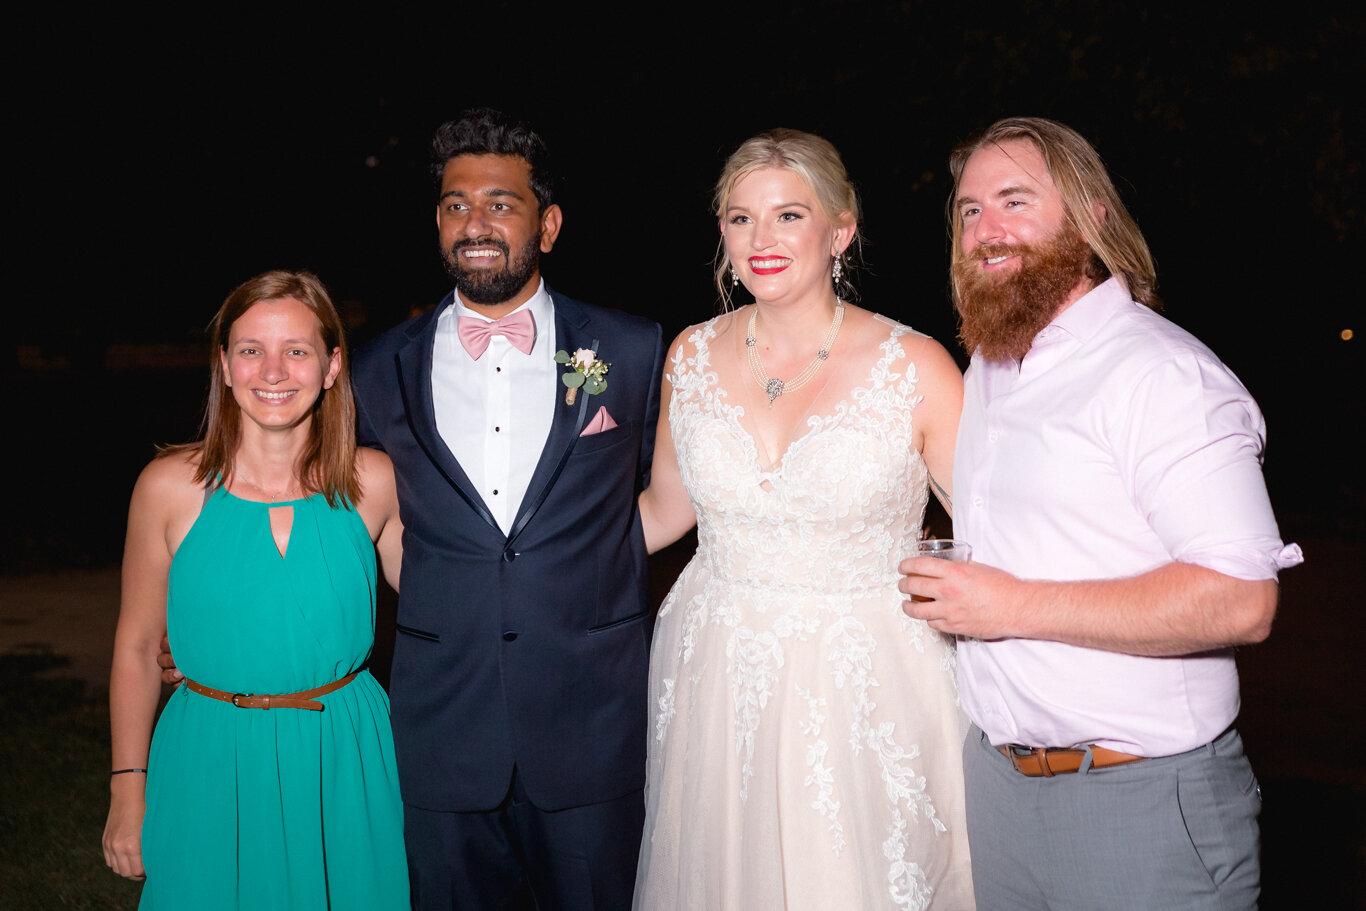 2019.08.24_Emily-Ashir-Wedding-at-the-Maples-6380.jpg